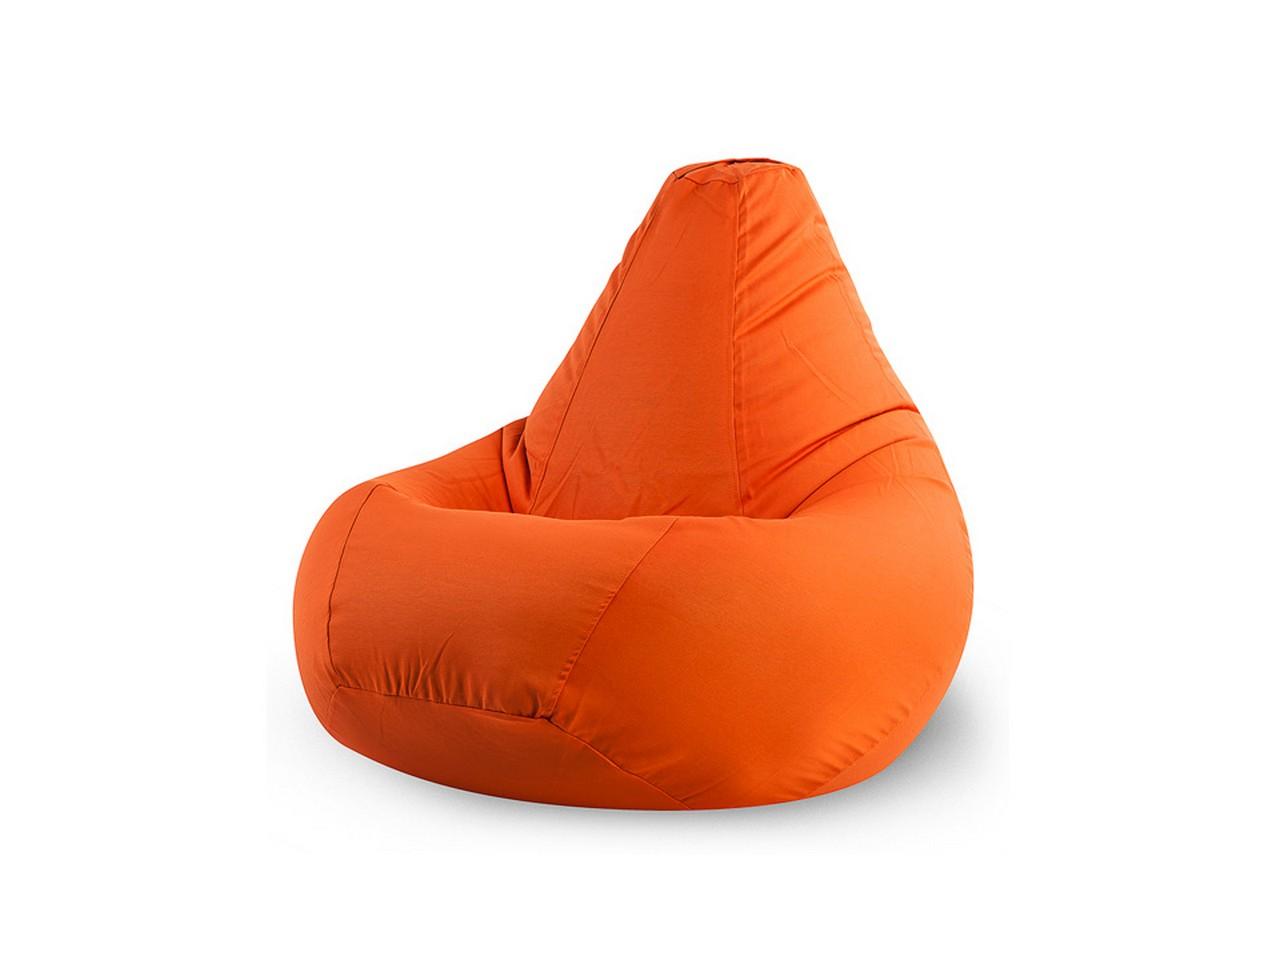 Кресло-мешок Pesko Orange XLБесформенные пуфы<br>&amp;lt;div&amp;gt;Съемный чехол: Да (на молнии);&amp;lt;/div&amp;gt;&amp;lt;div&amp;gt;Наполнитель: пенополистирол (гранула 2 мм).&amp;lt;/div&amp;gt;<br><br>Material: Текстиль<br>Length см: None<br>Height см: 135<br>Diameter см: 90